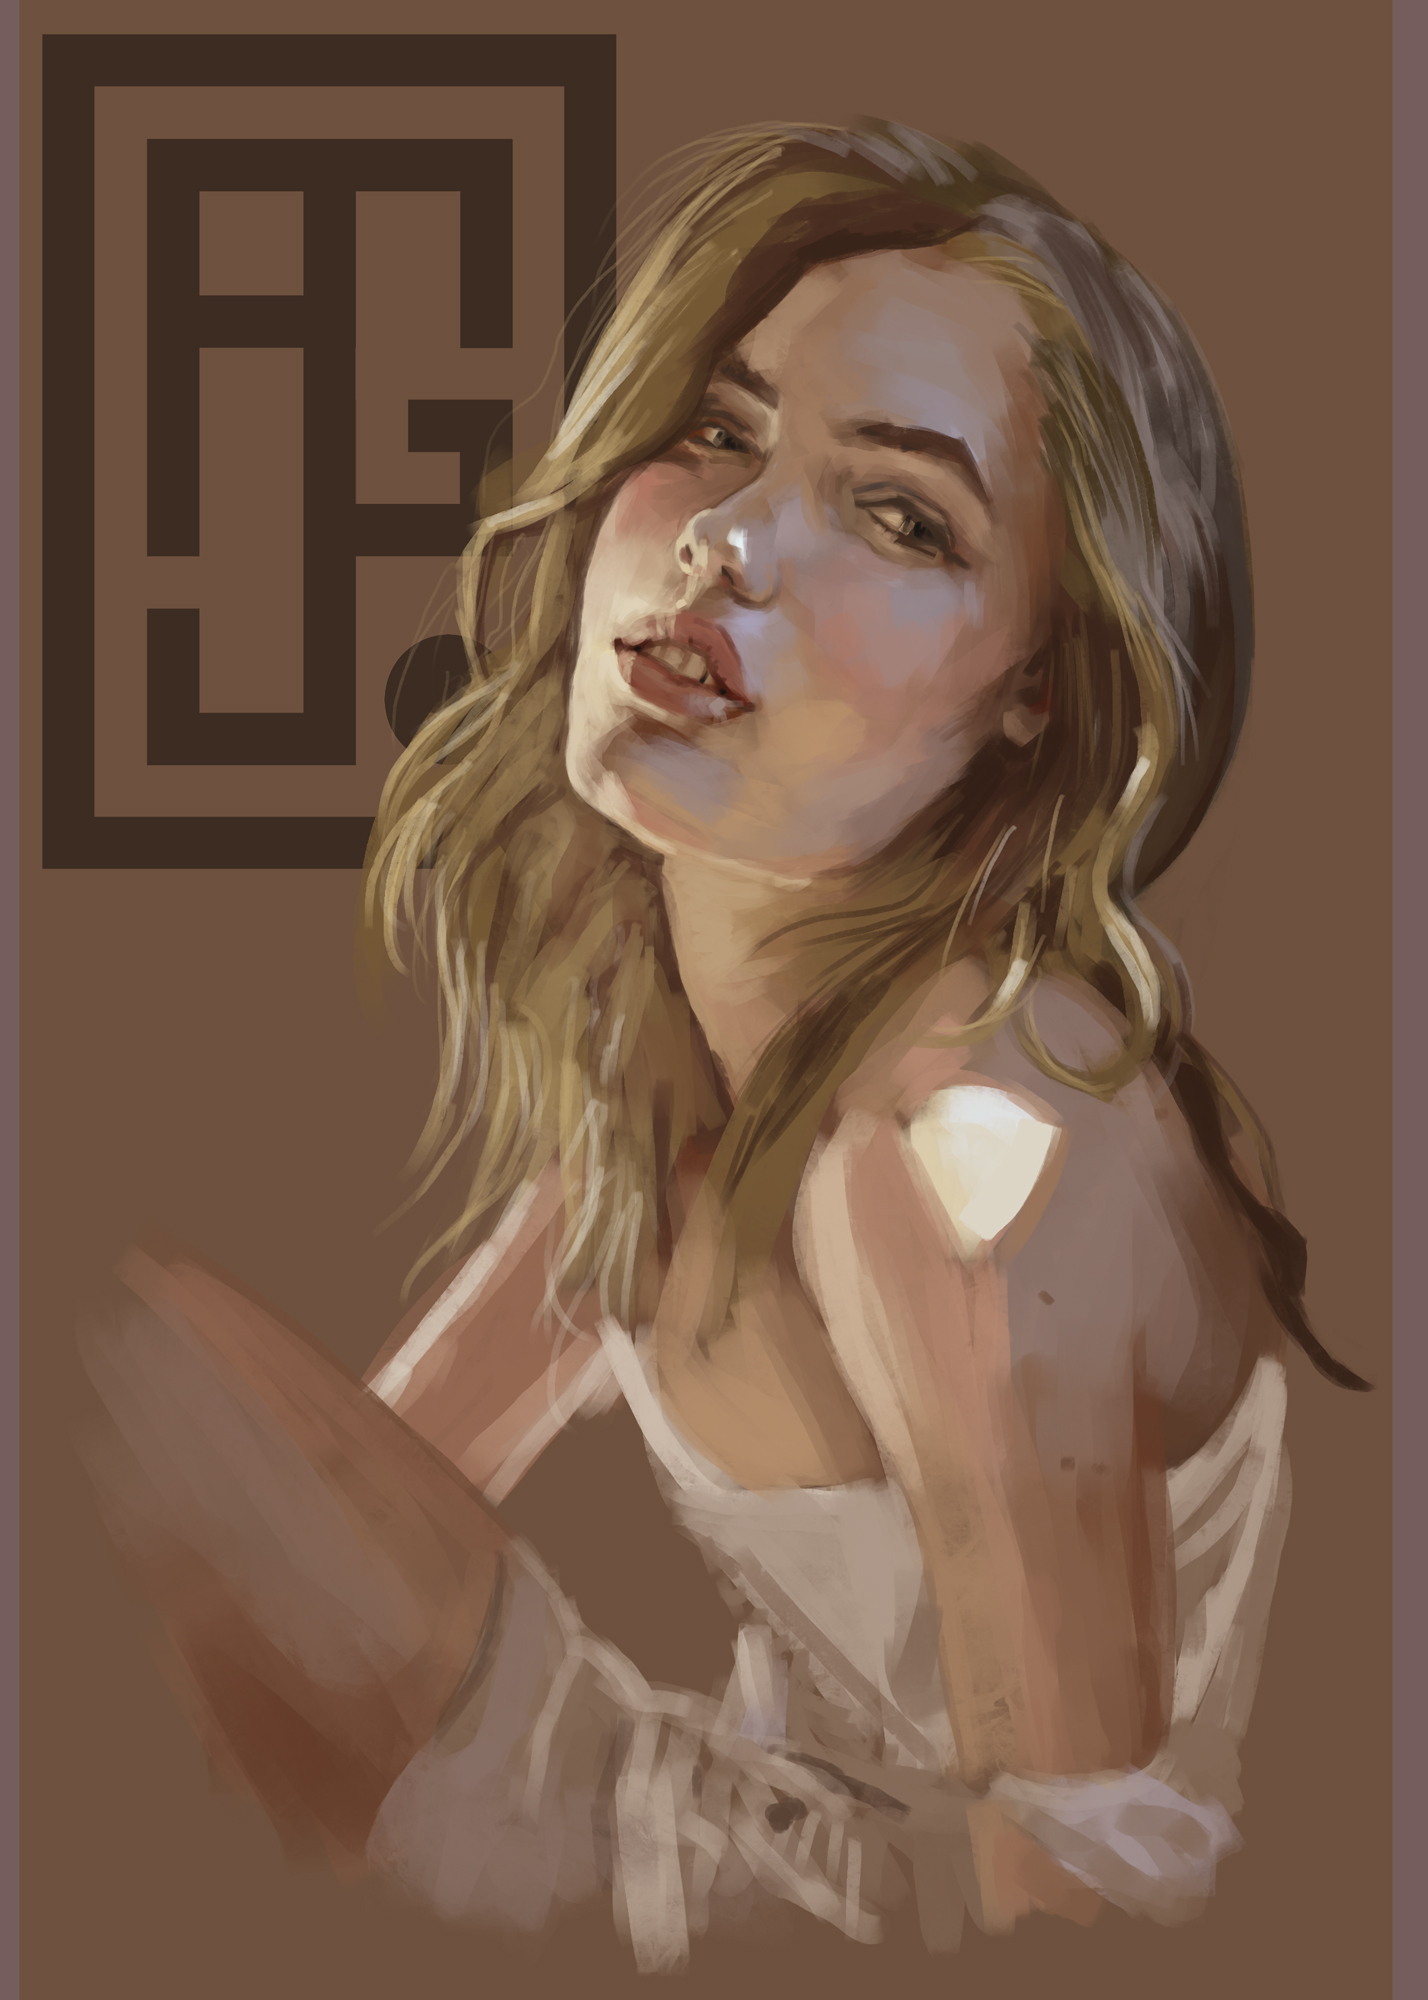 [Image: 1_hour_portrait_study_by_xelfereht-d9onf74.jpg]